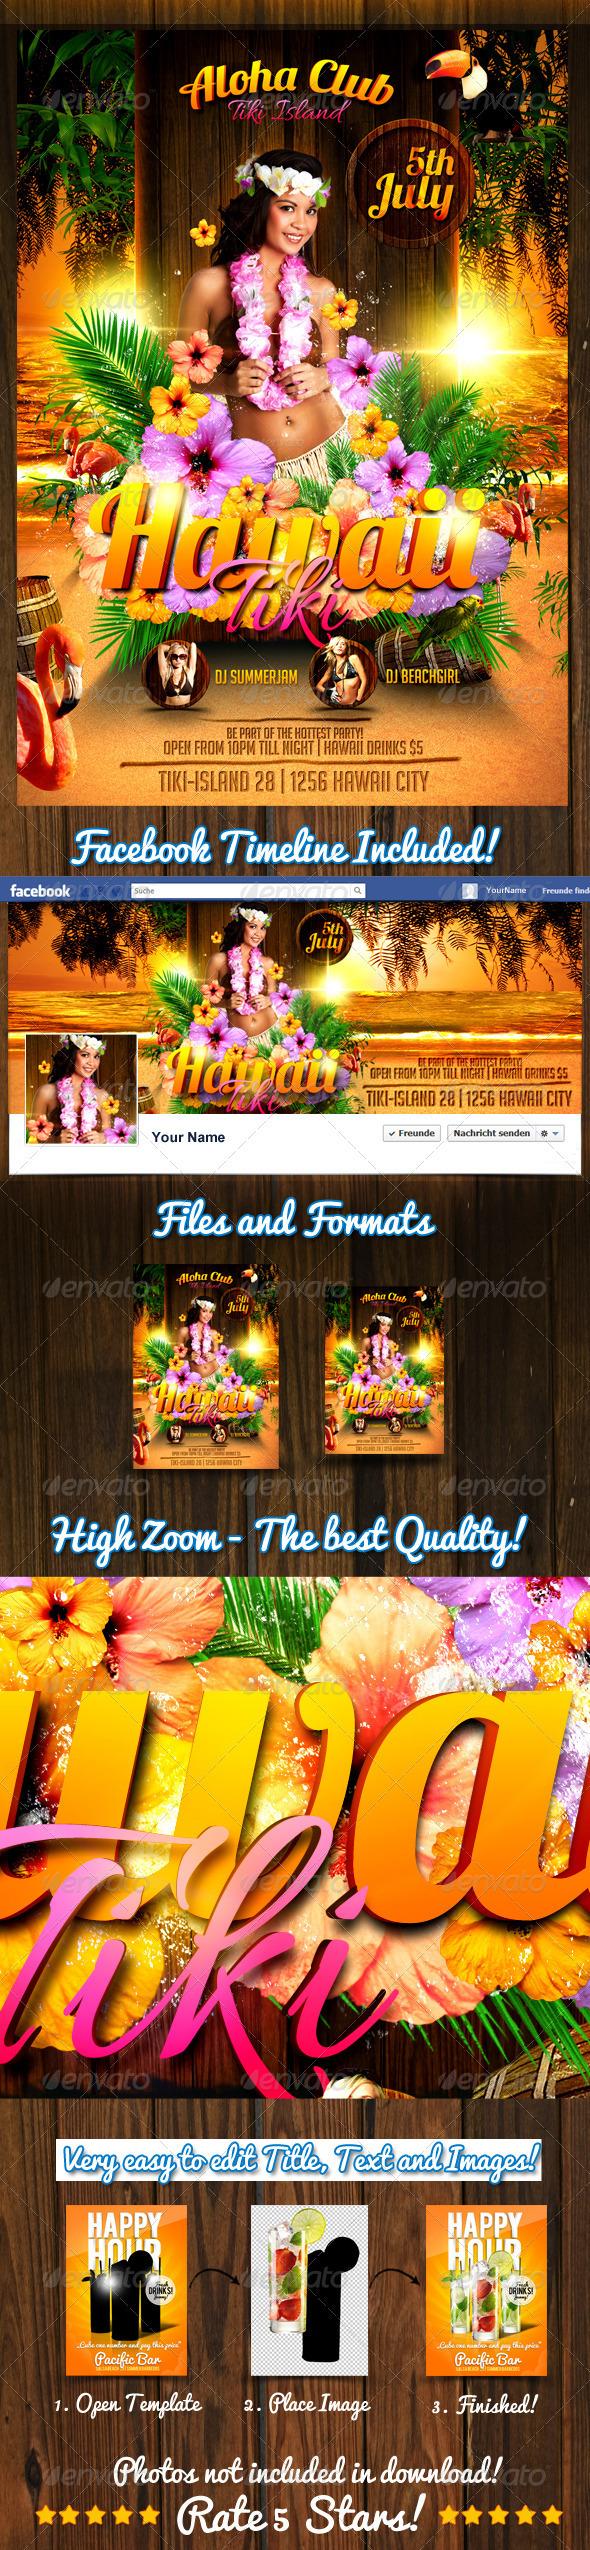 hawaii tiki flyer template on behance